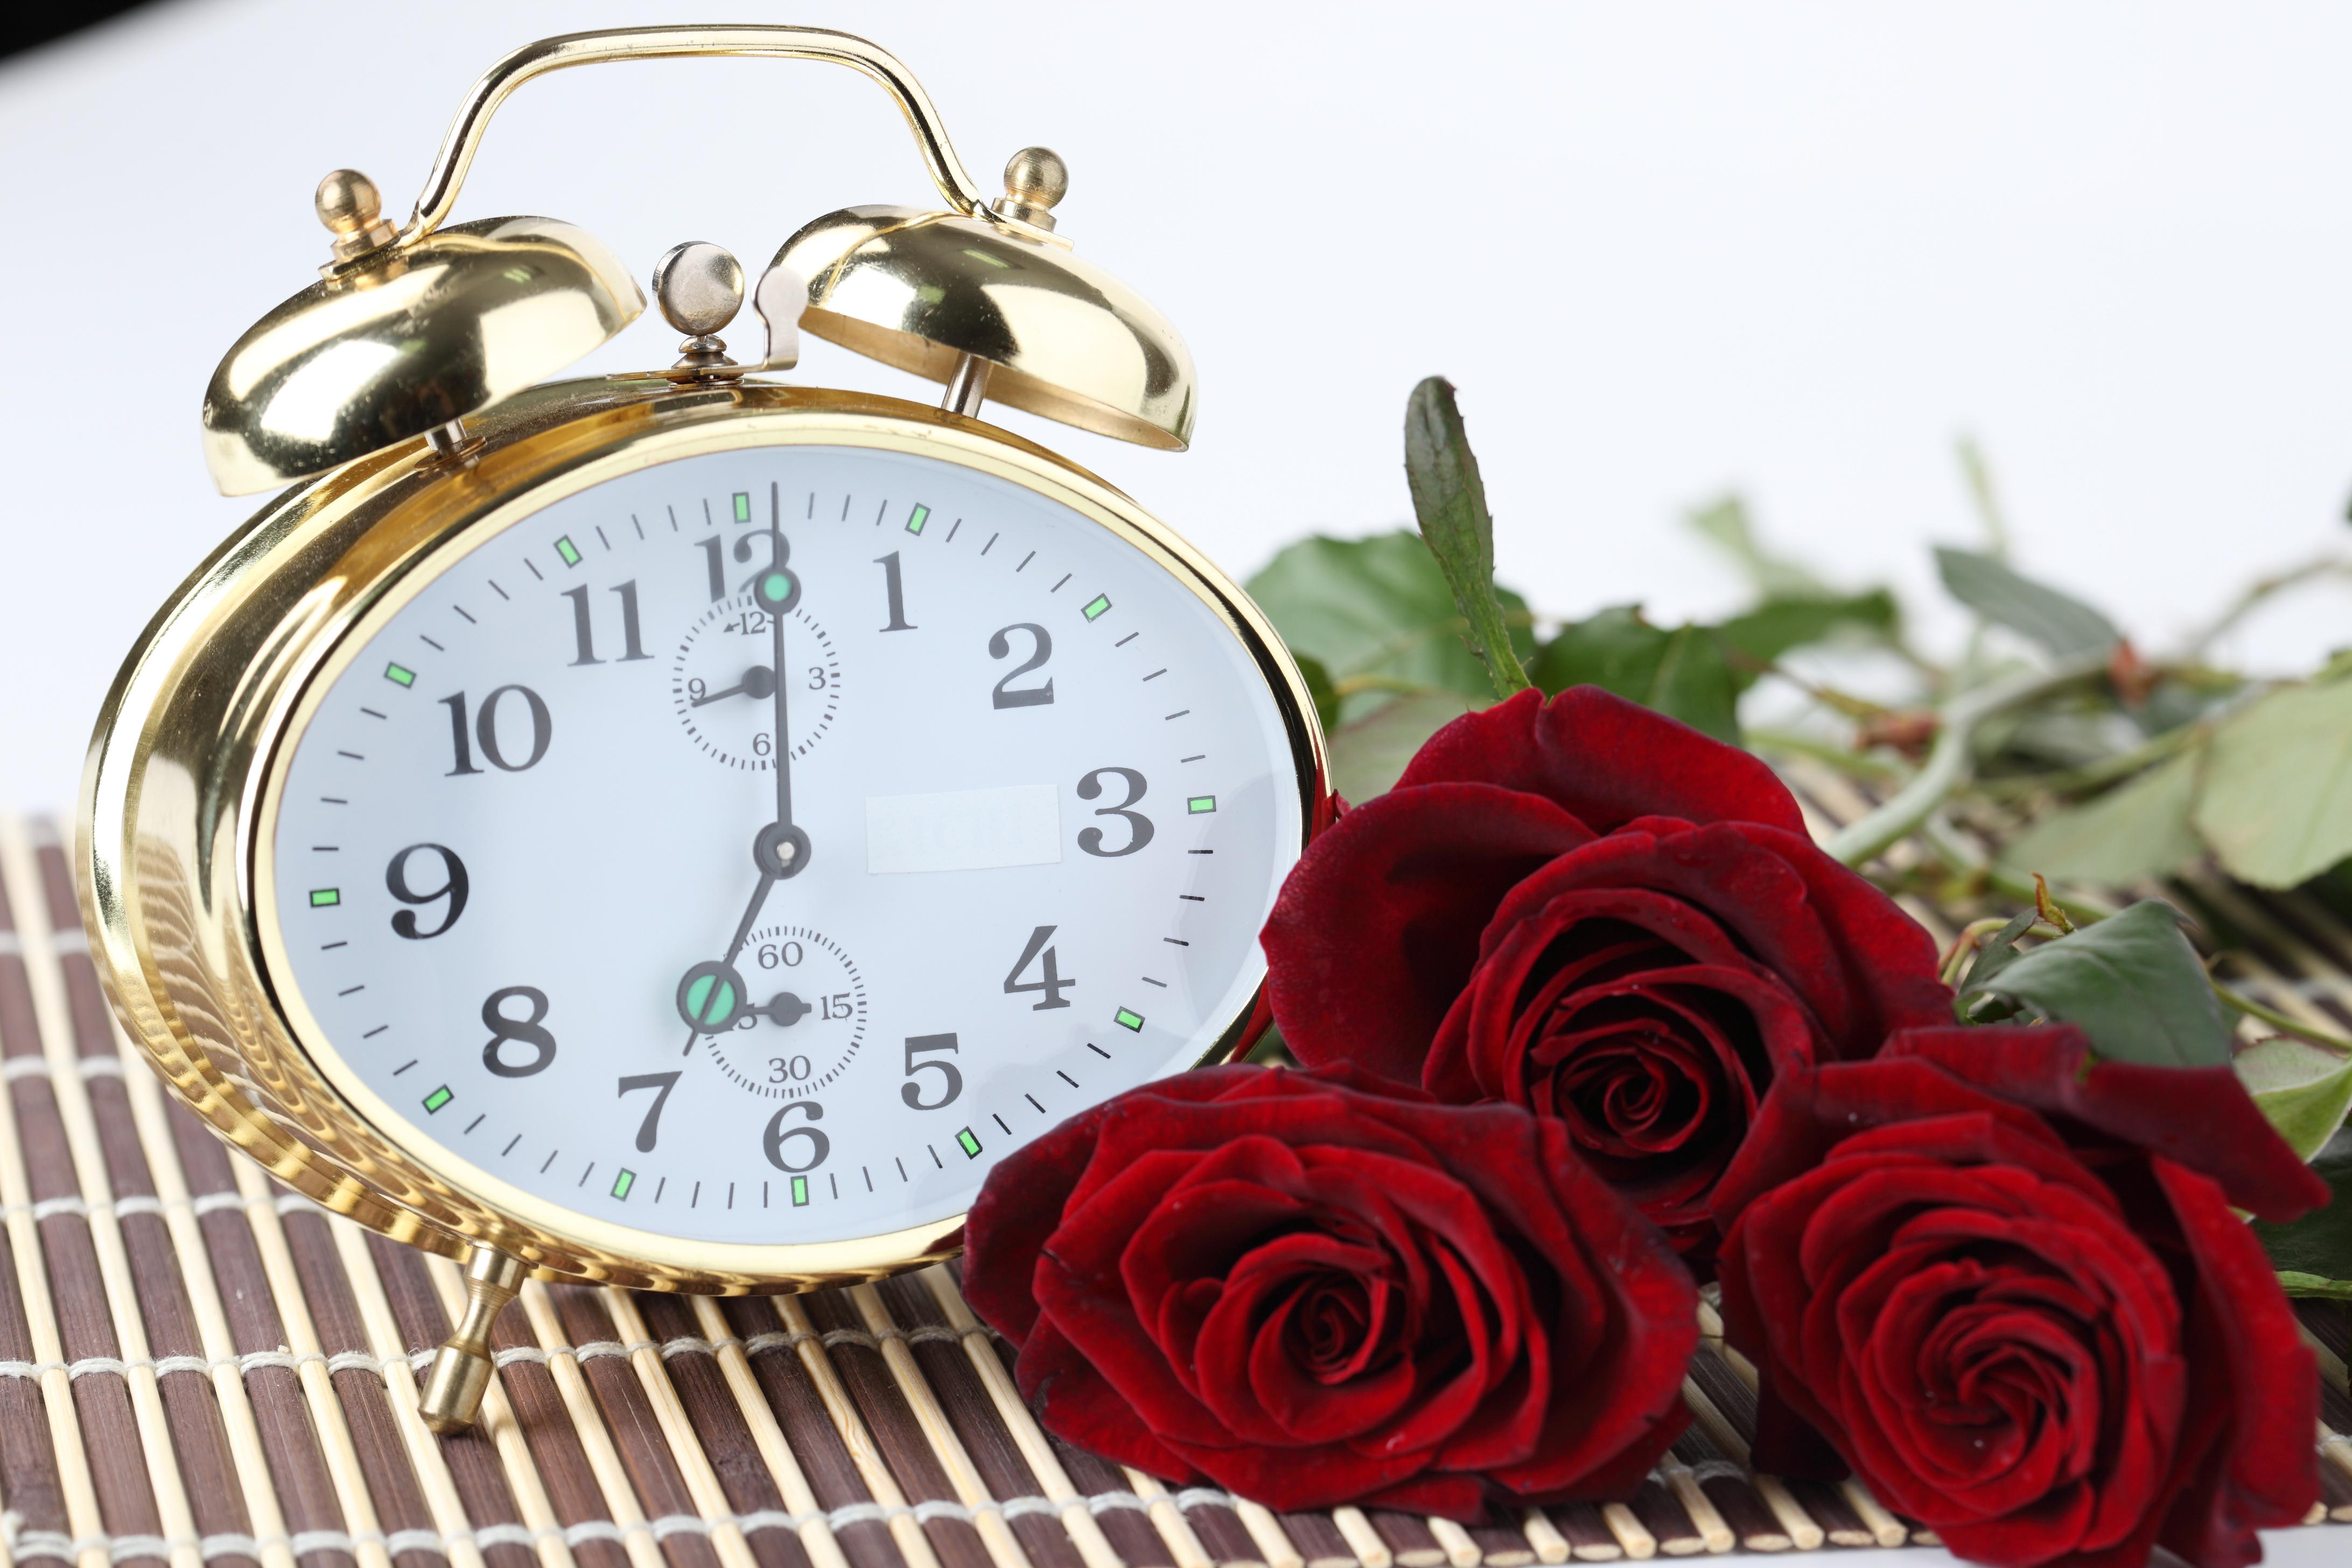 Good Morning Beautiful Lyric : Good morning beautiful lyrics hd wallpapers